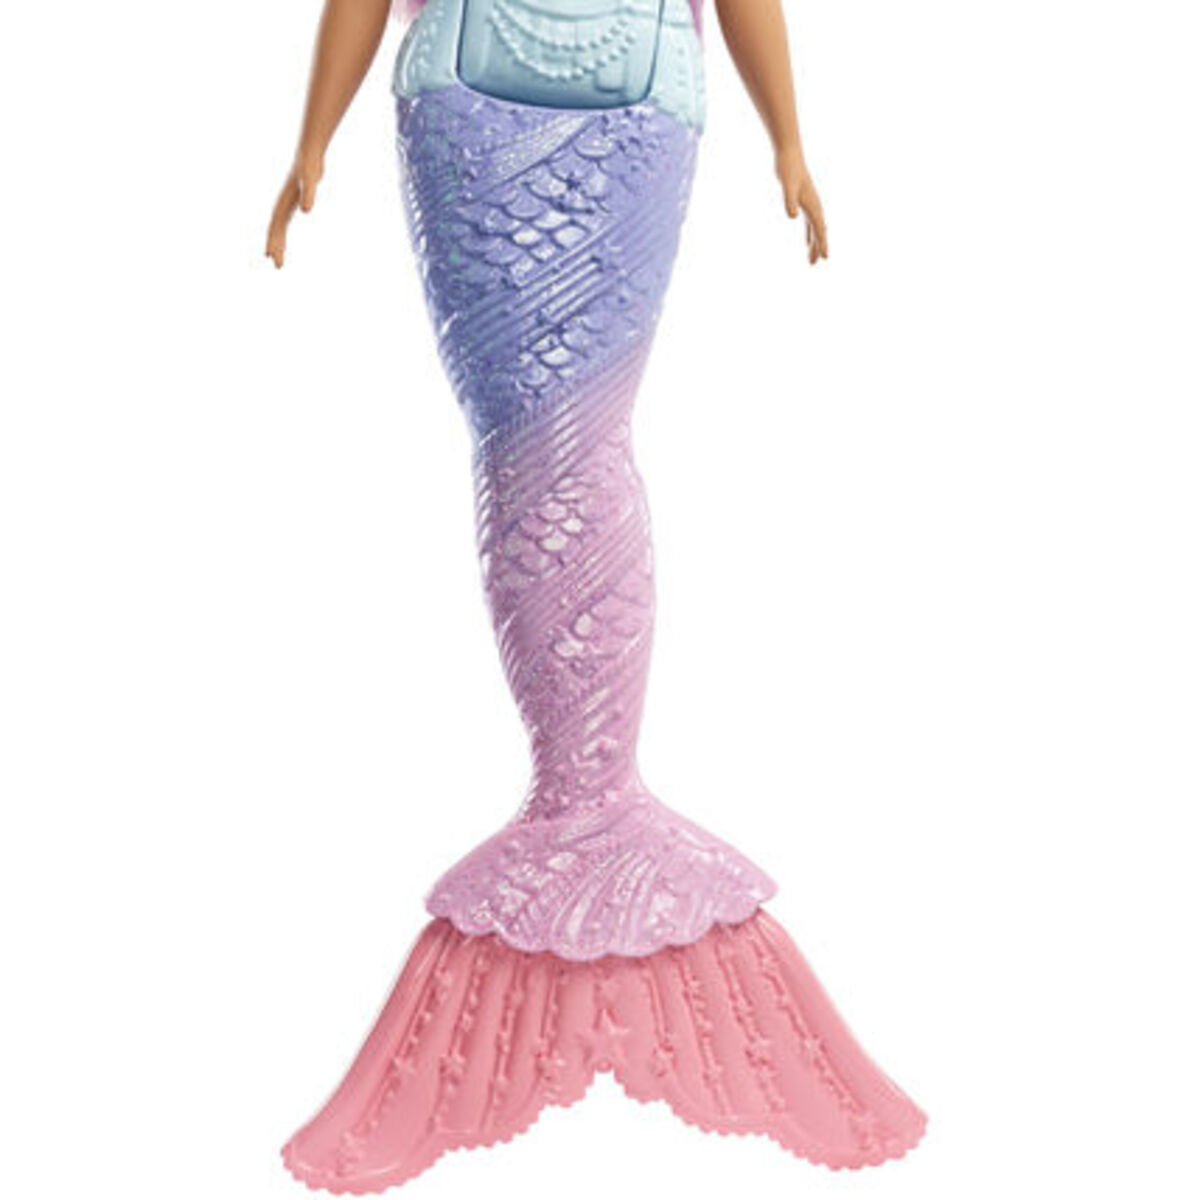 Bild 3 von Barbie Dreamtopia Meerjungfrau, lila Haare